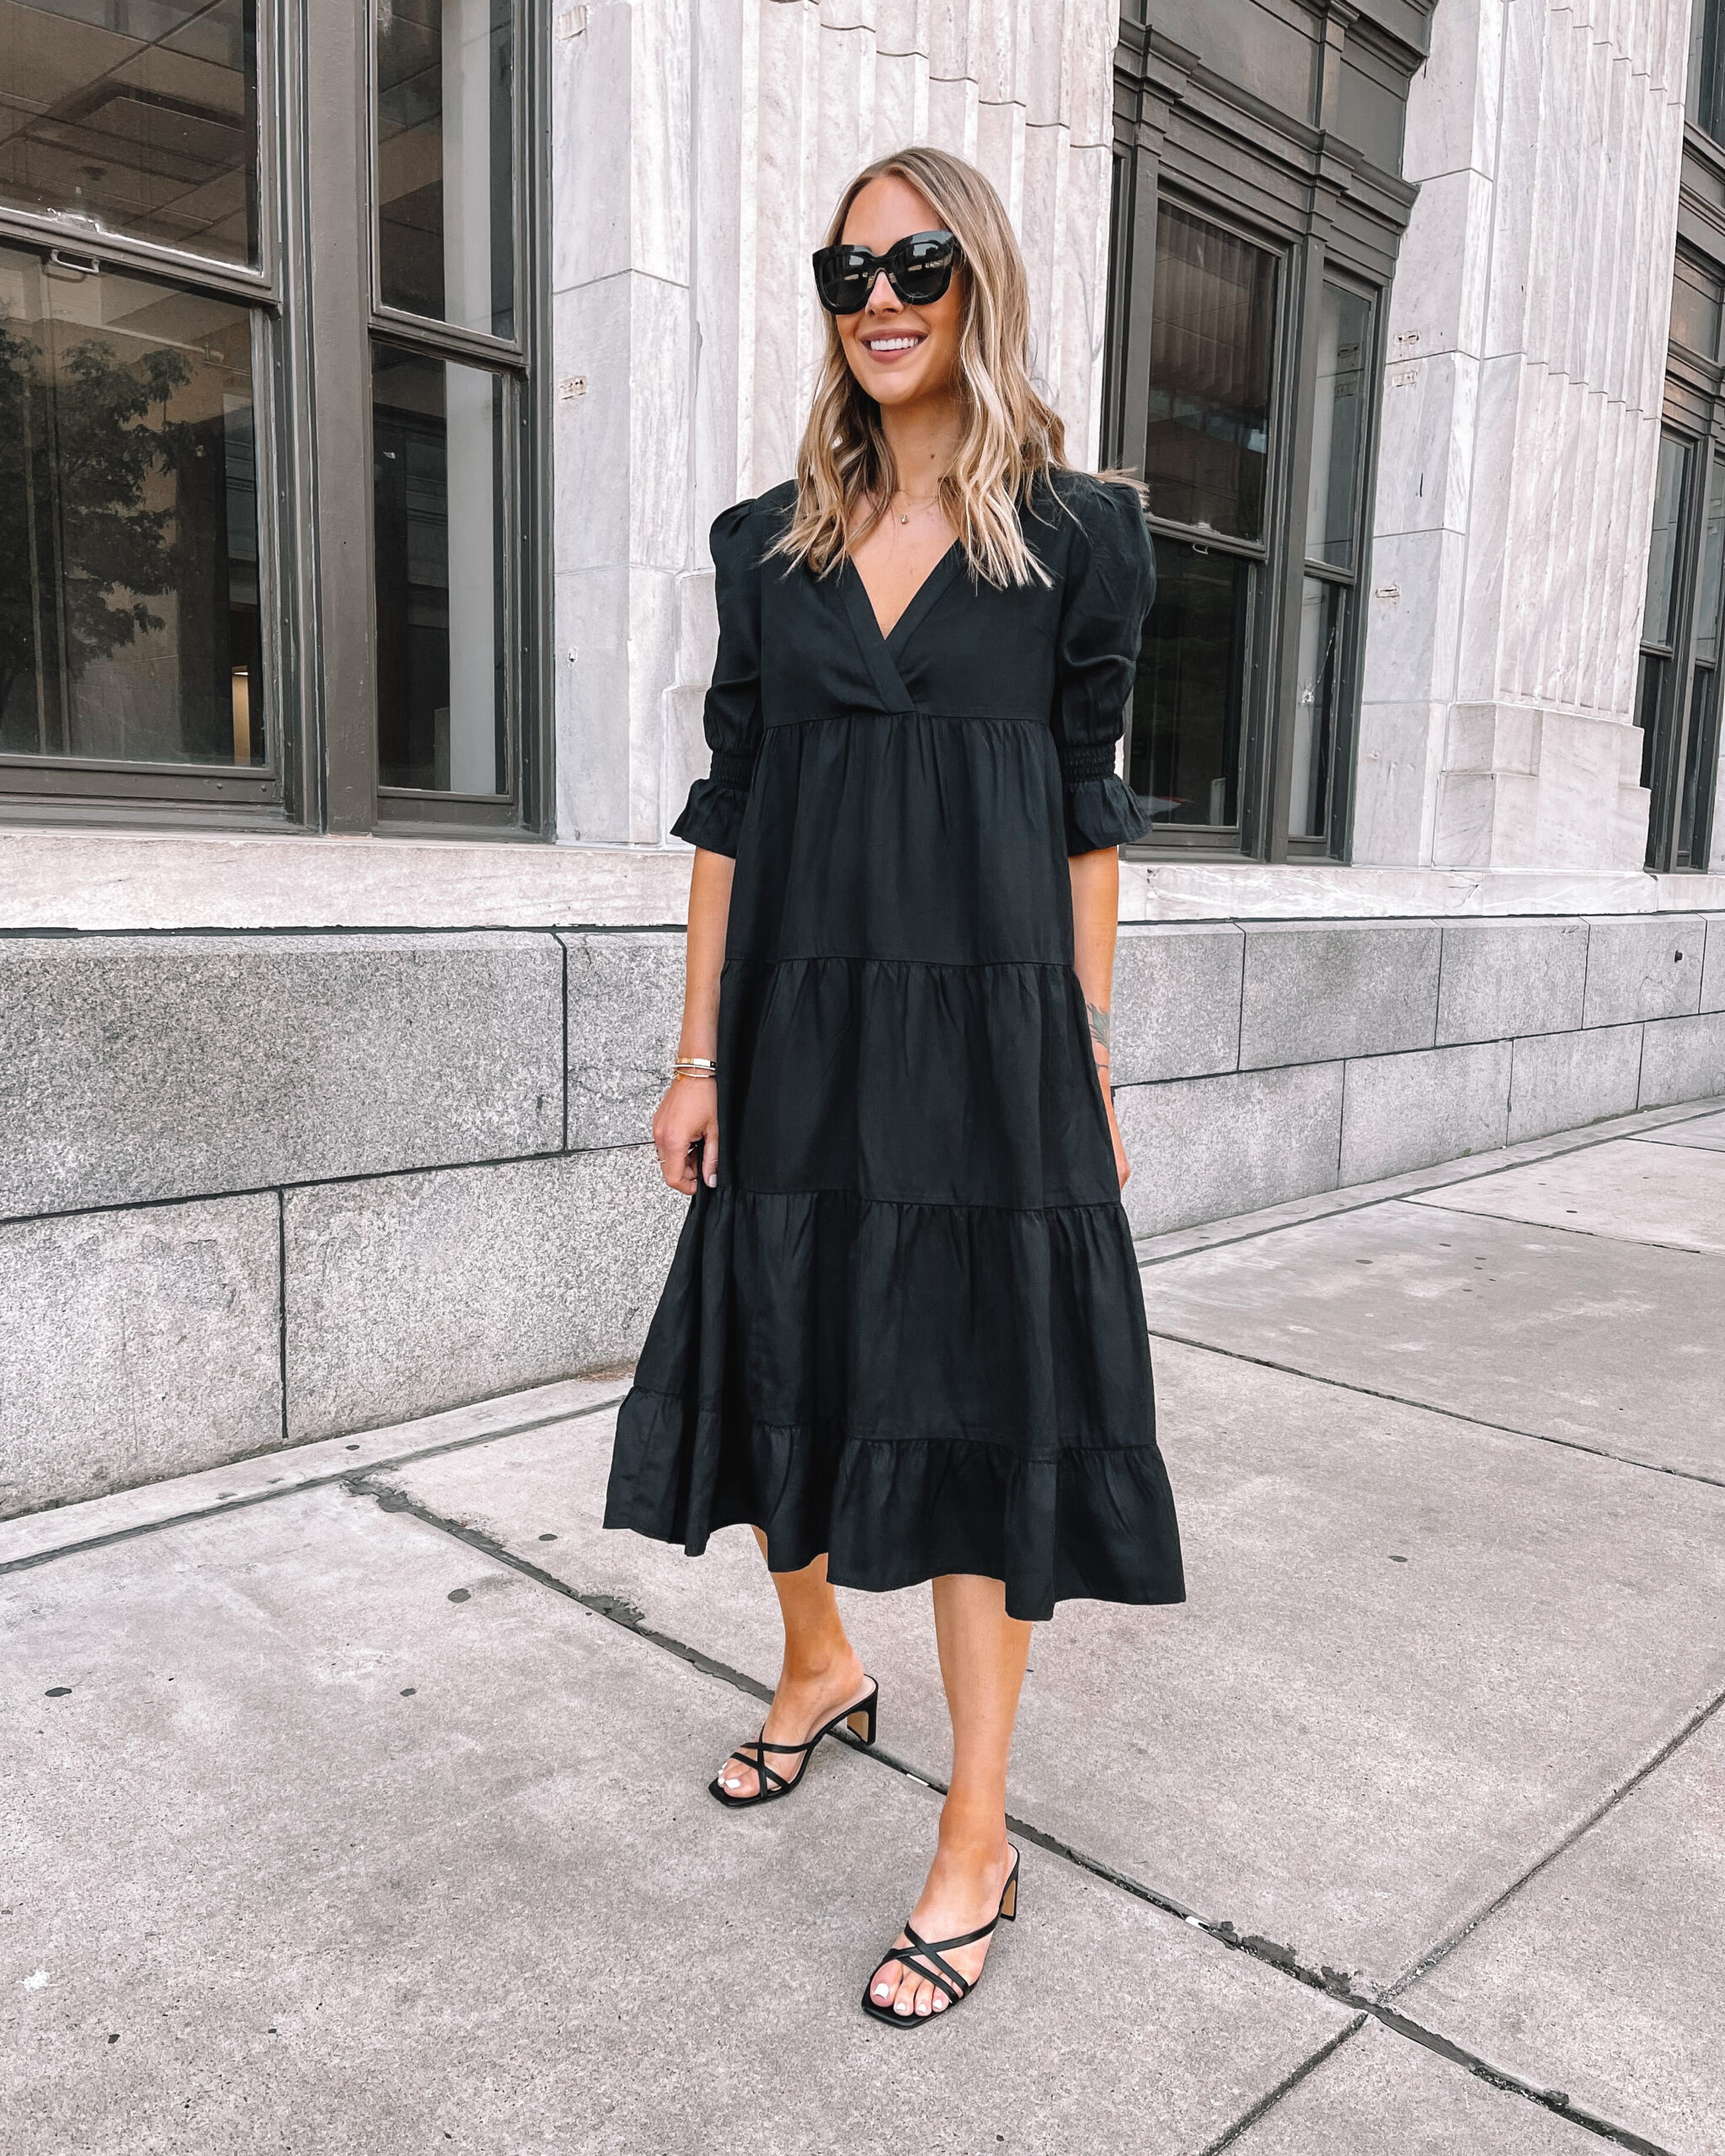 Fashion Jackson Wearing Amazon Fashion Black Ruffle Midi Dress Black Strappy Sandals